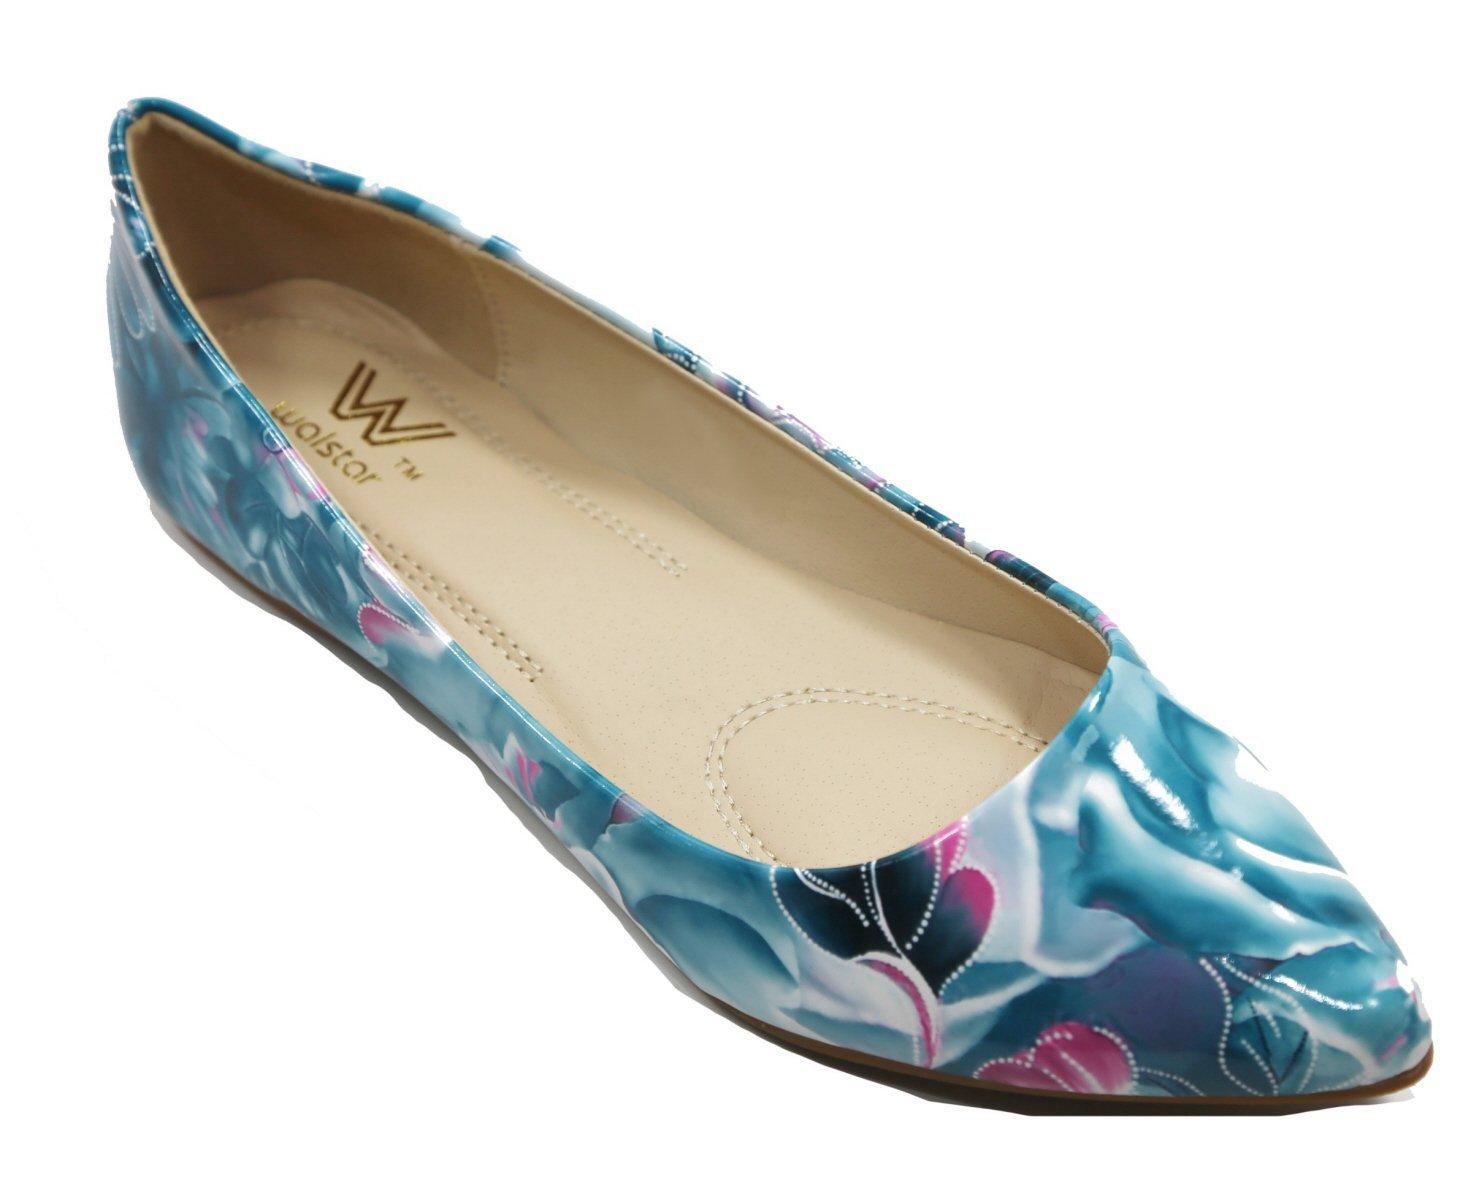 Walstar Women's Basic Point Toe Ballet Flats B00U6K0JQO 7.5 B(M) US|Flo11-blue